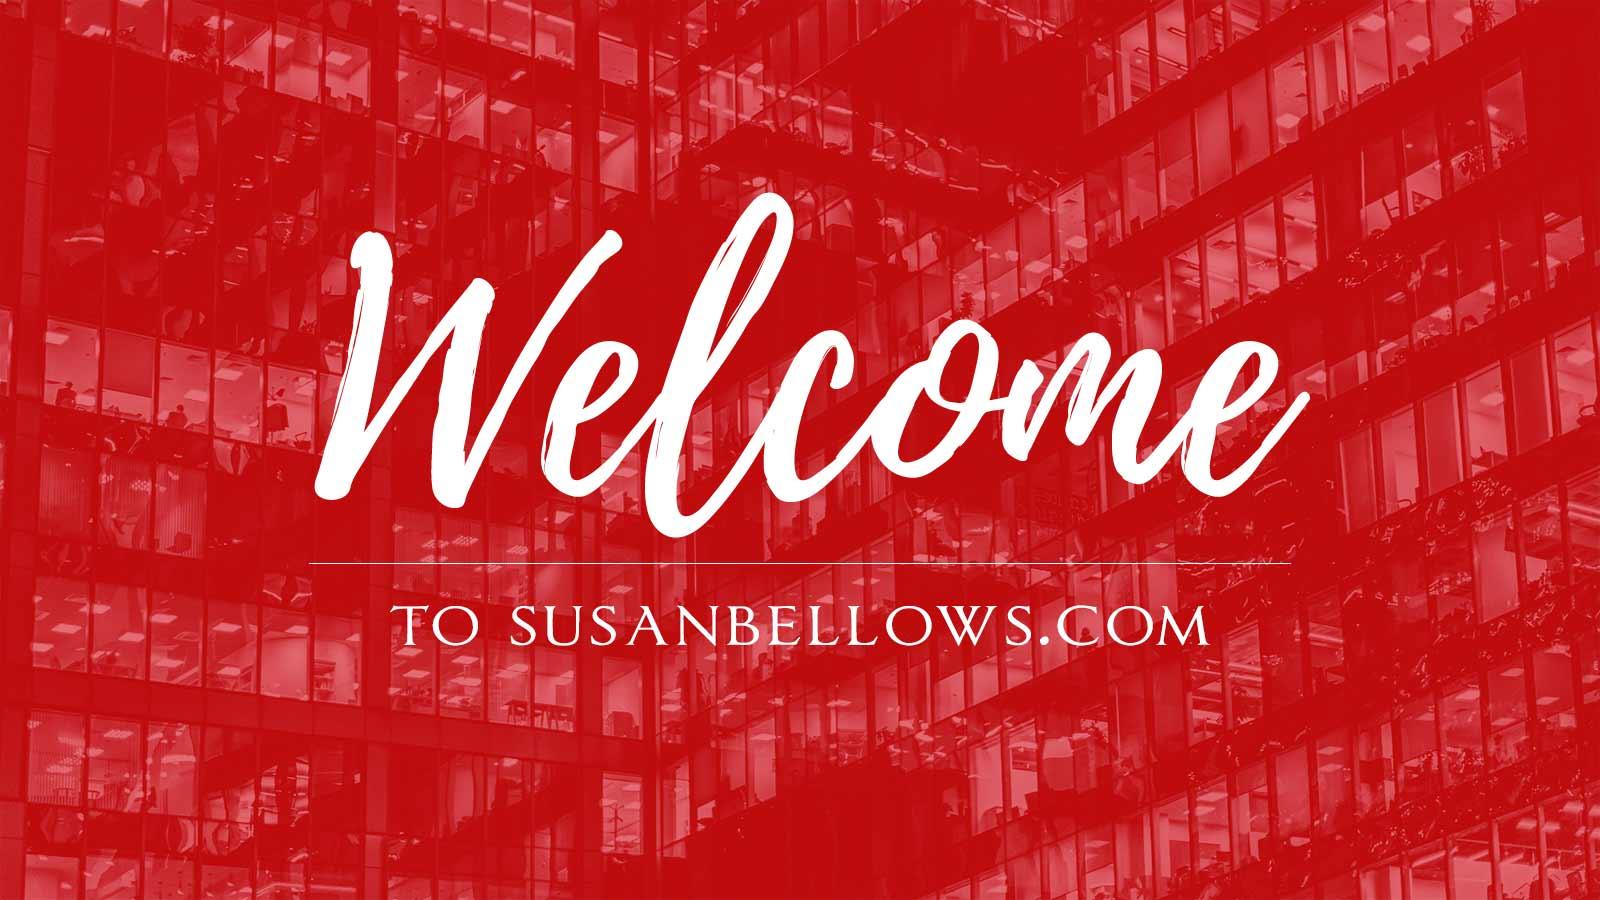 Welcome to Susanbellows.com